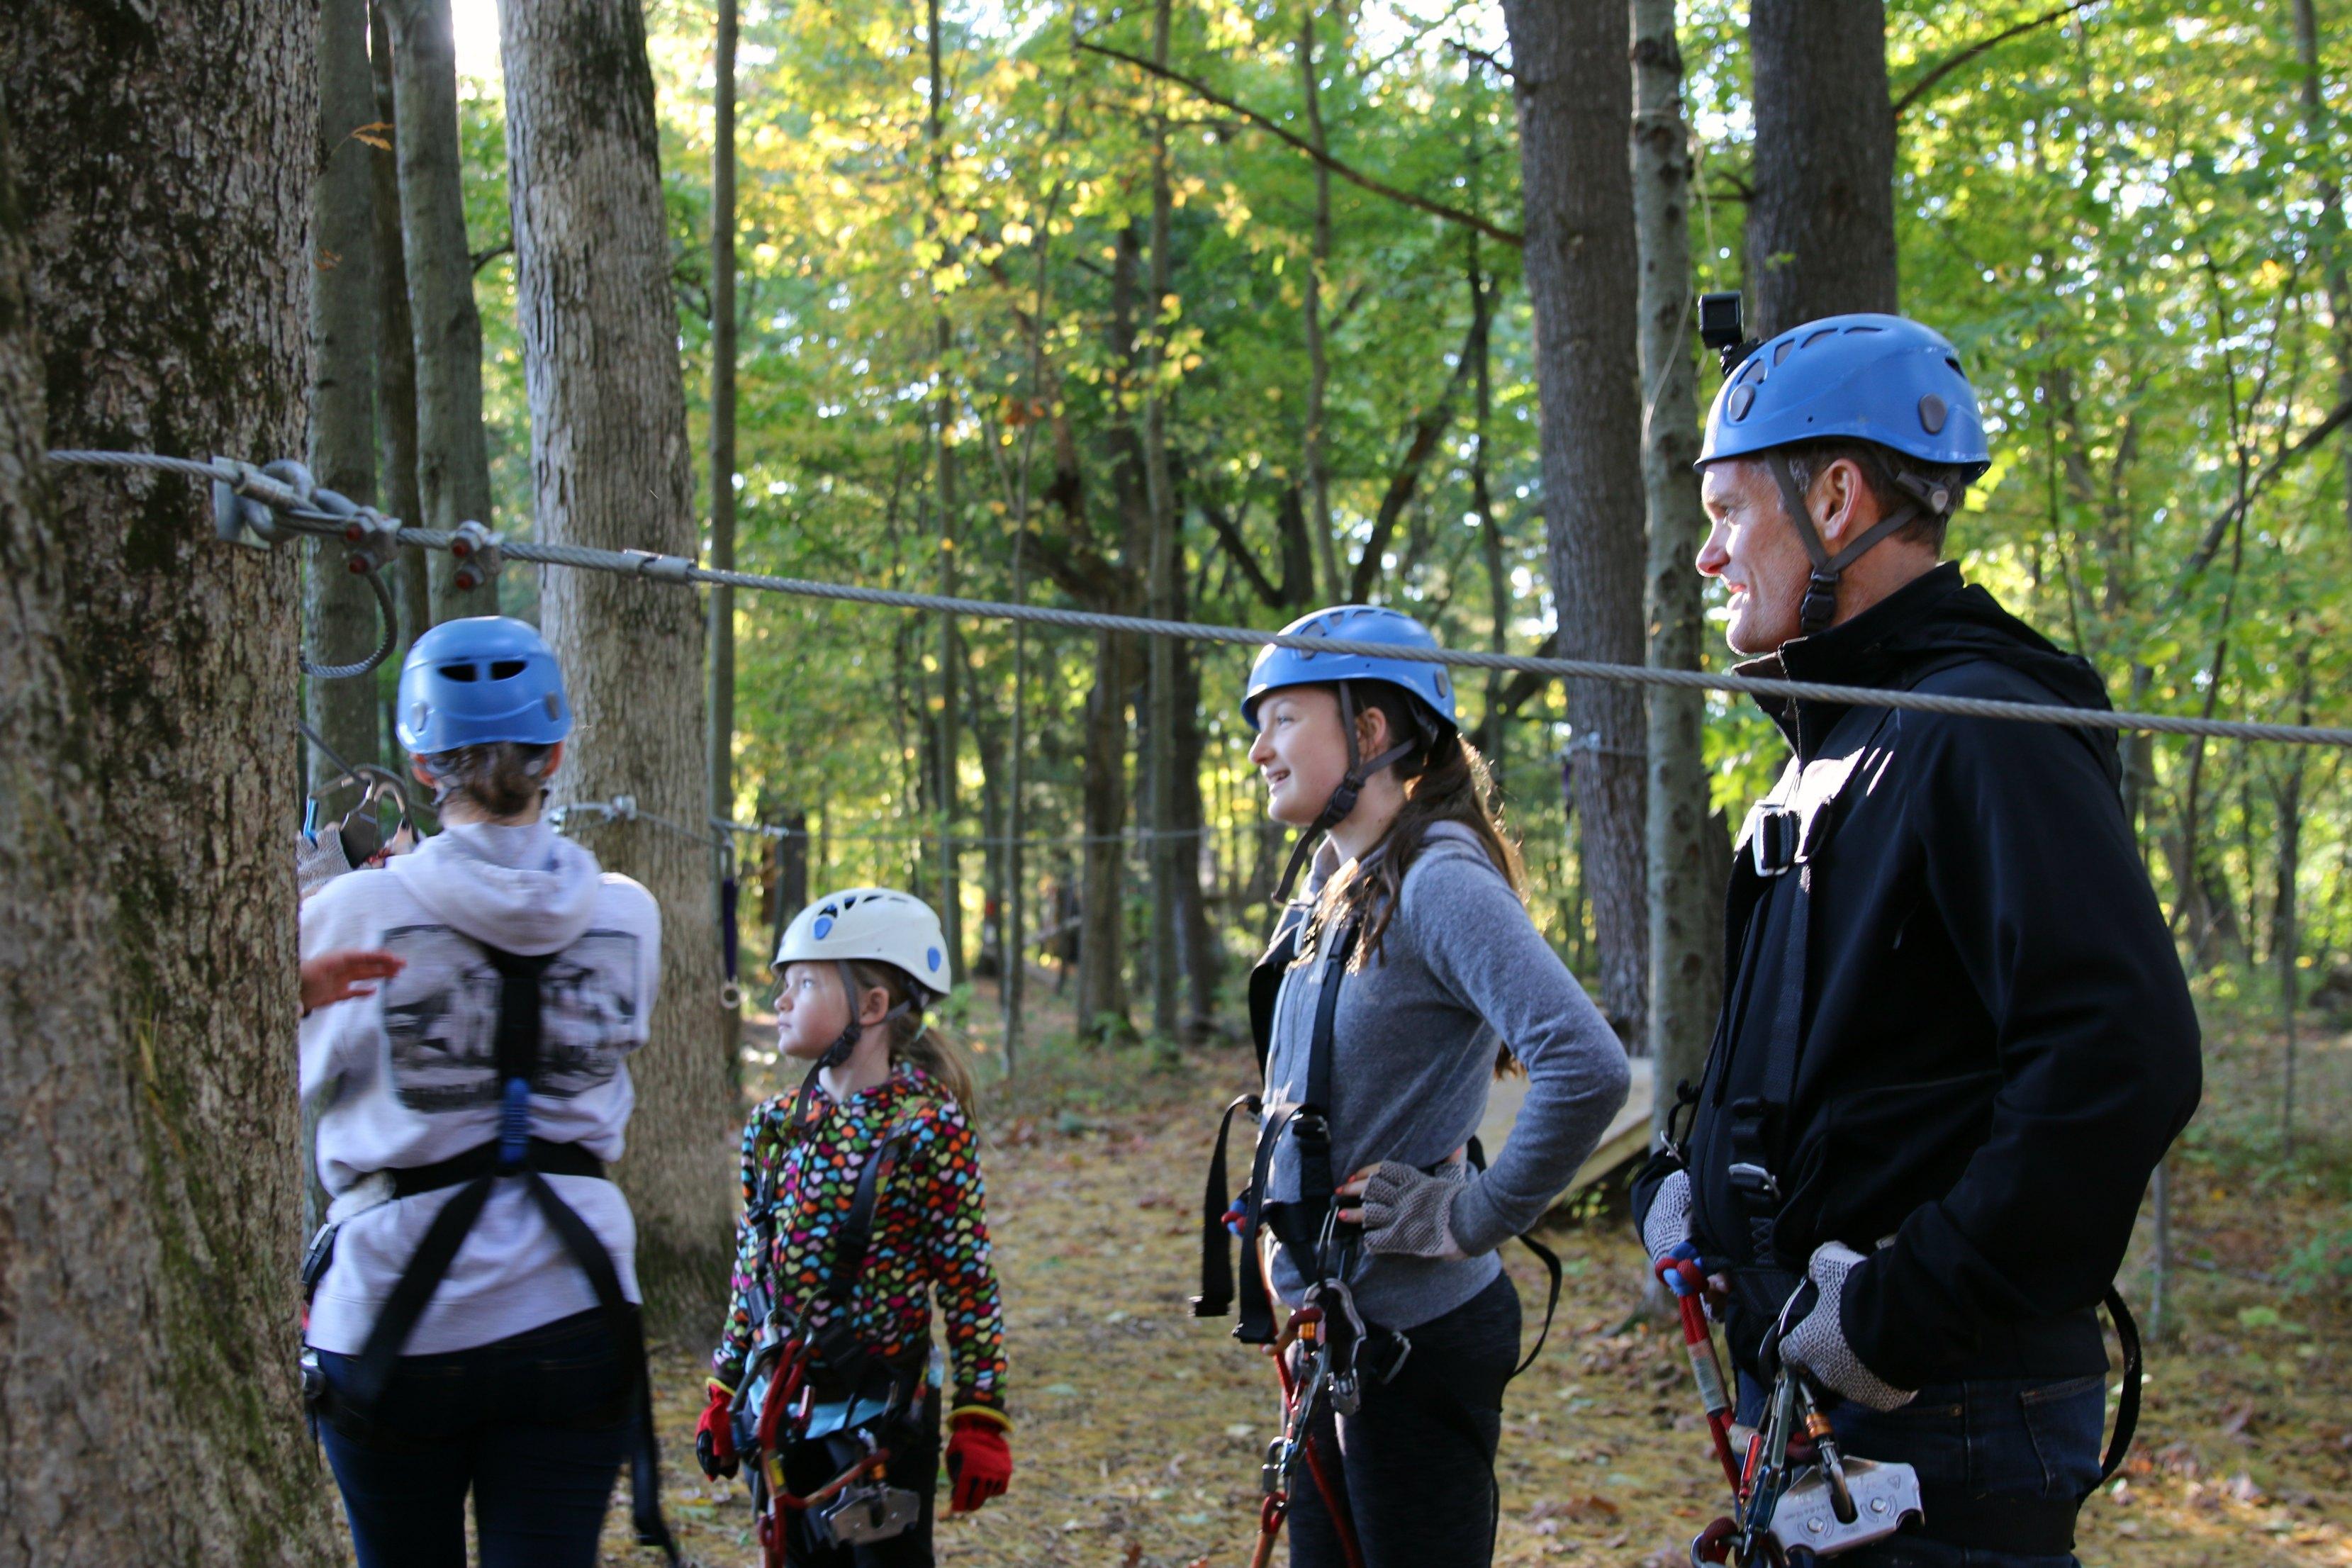 wisconsin-dells-adventure-park